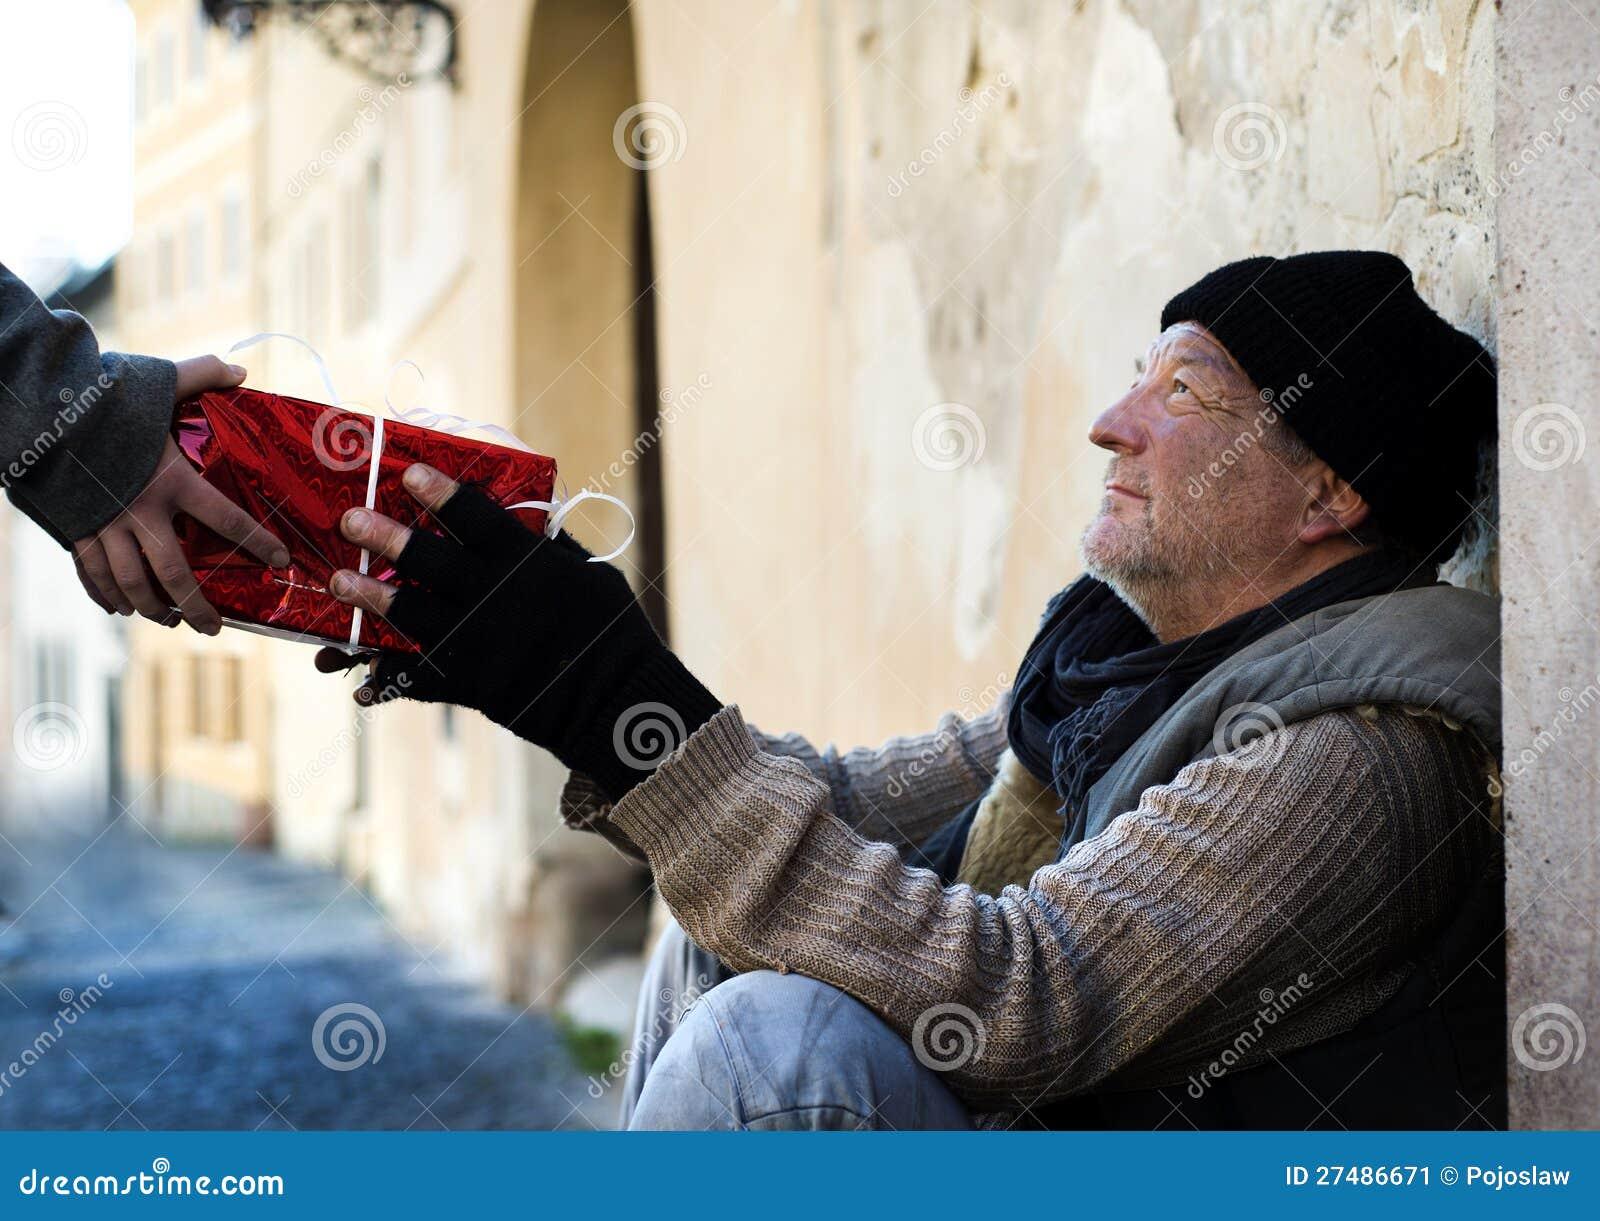 Christmas Gift For Homeless Man Stock Image